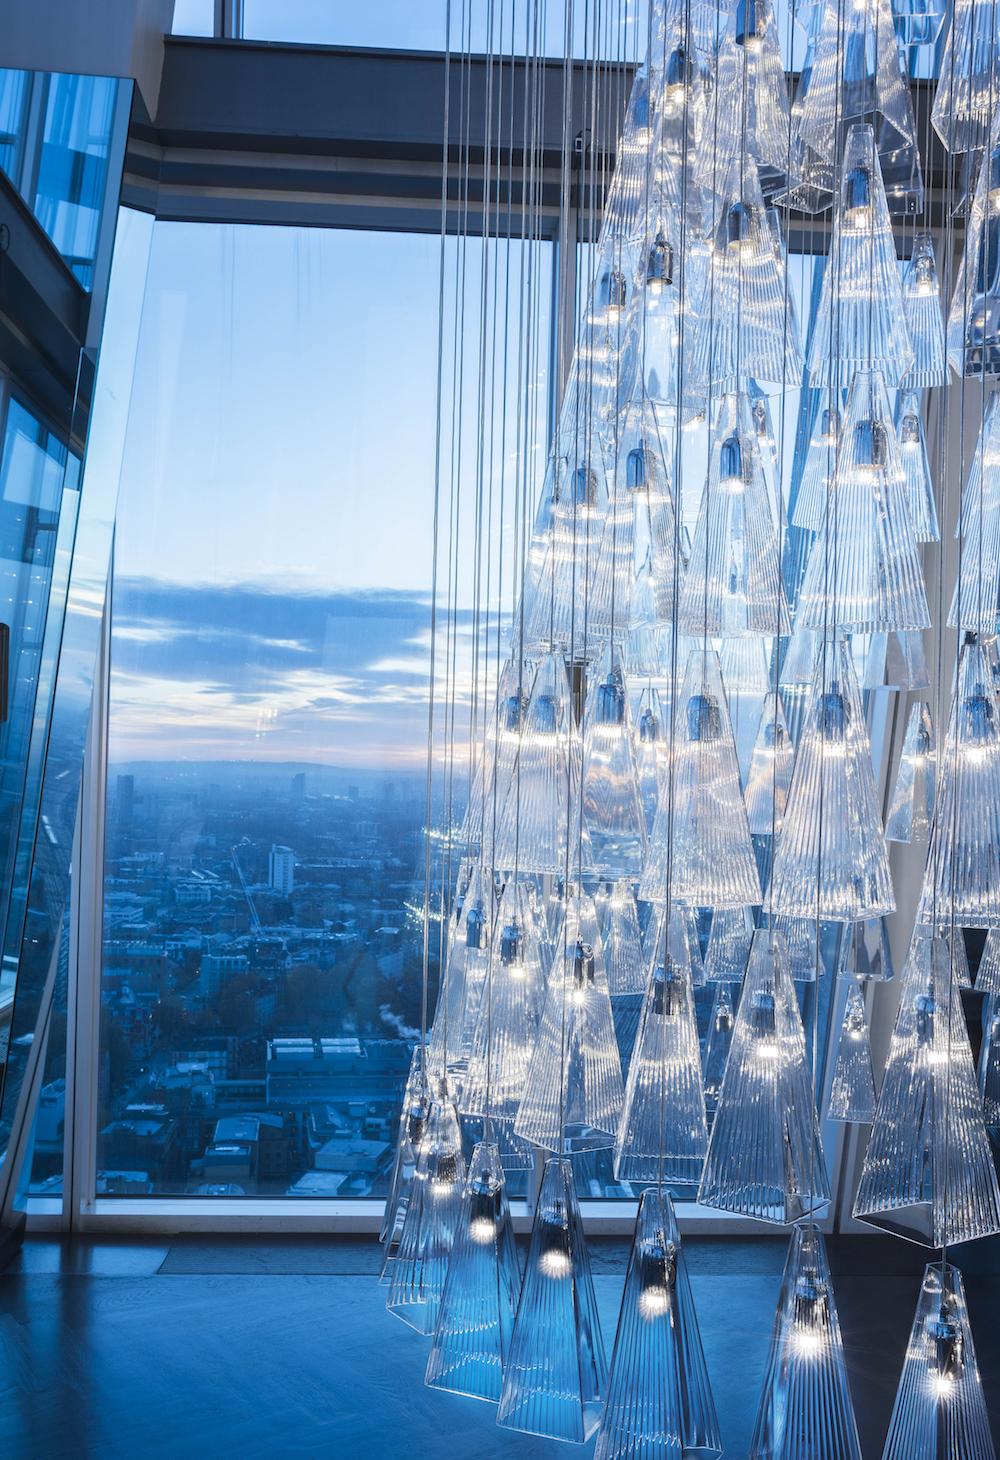 12 Lee Broom 'The Tree of Glass' at aqua shard (Photo Credit David Cleveland).jpg